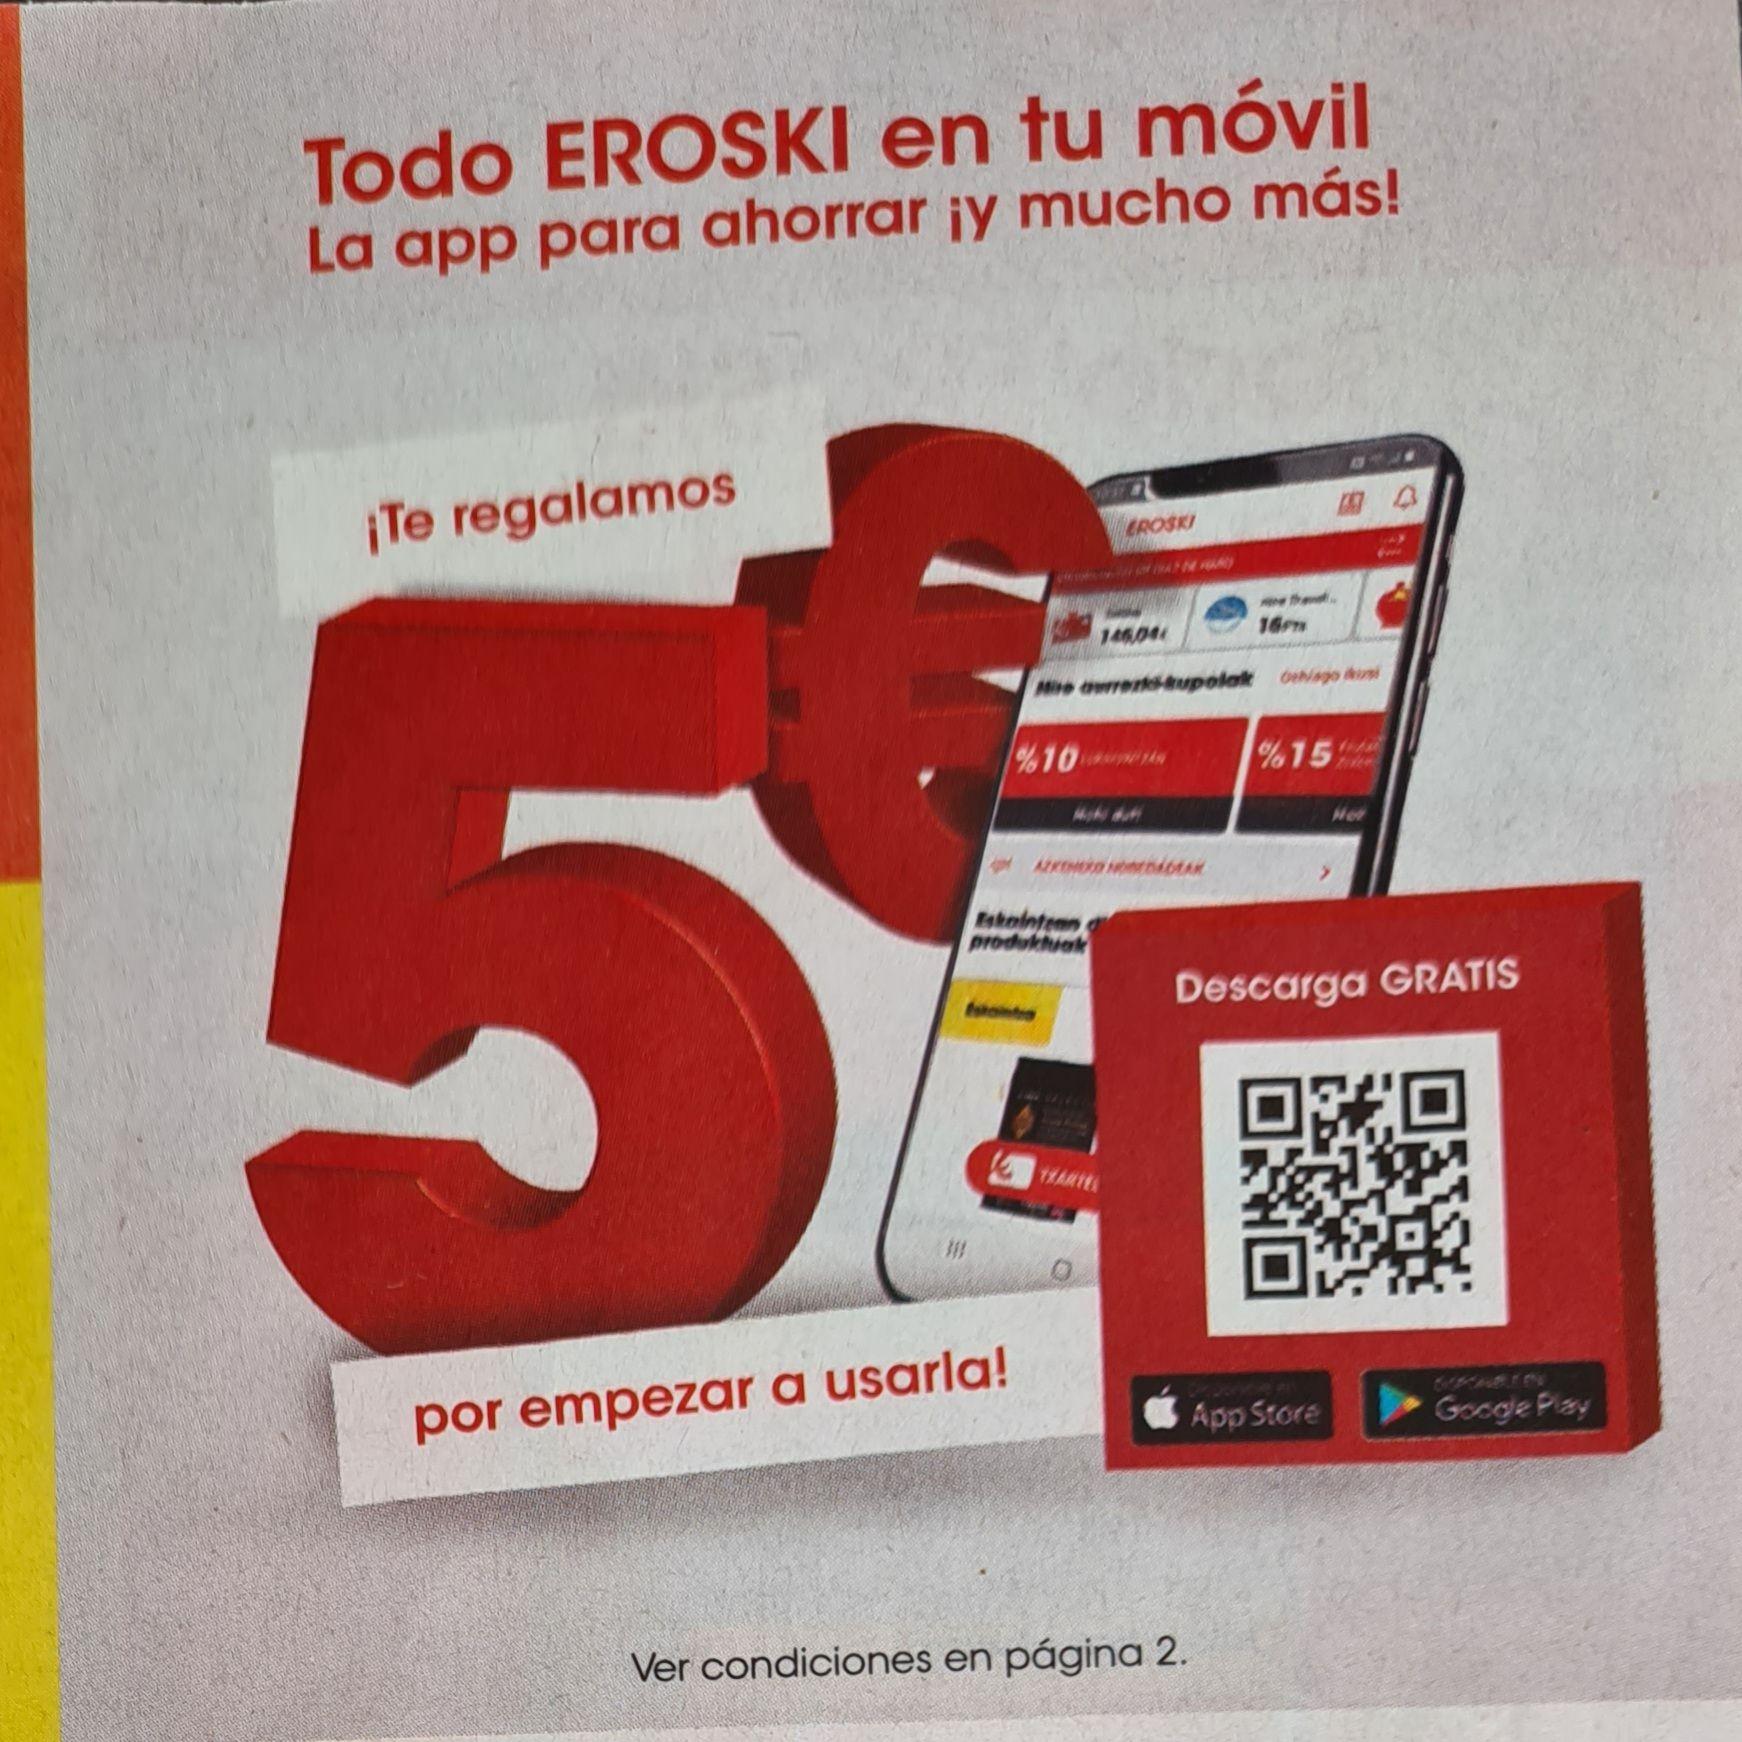 5€ Gratis para Eroski bajando su app